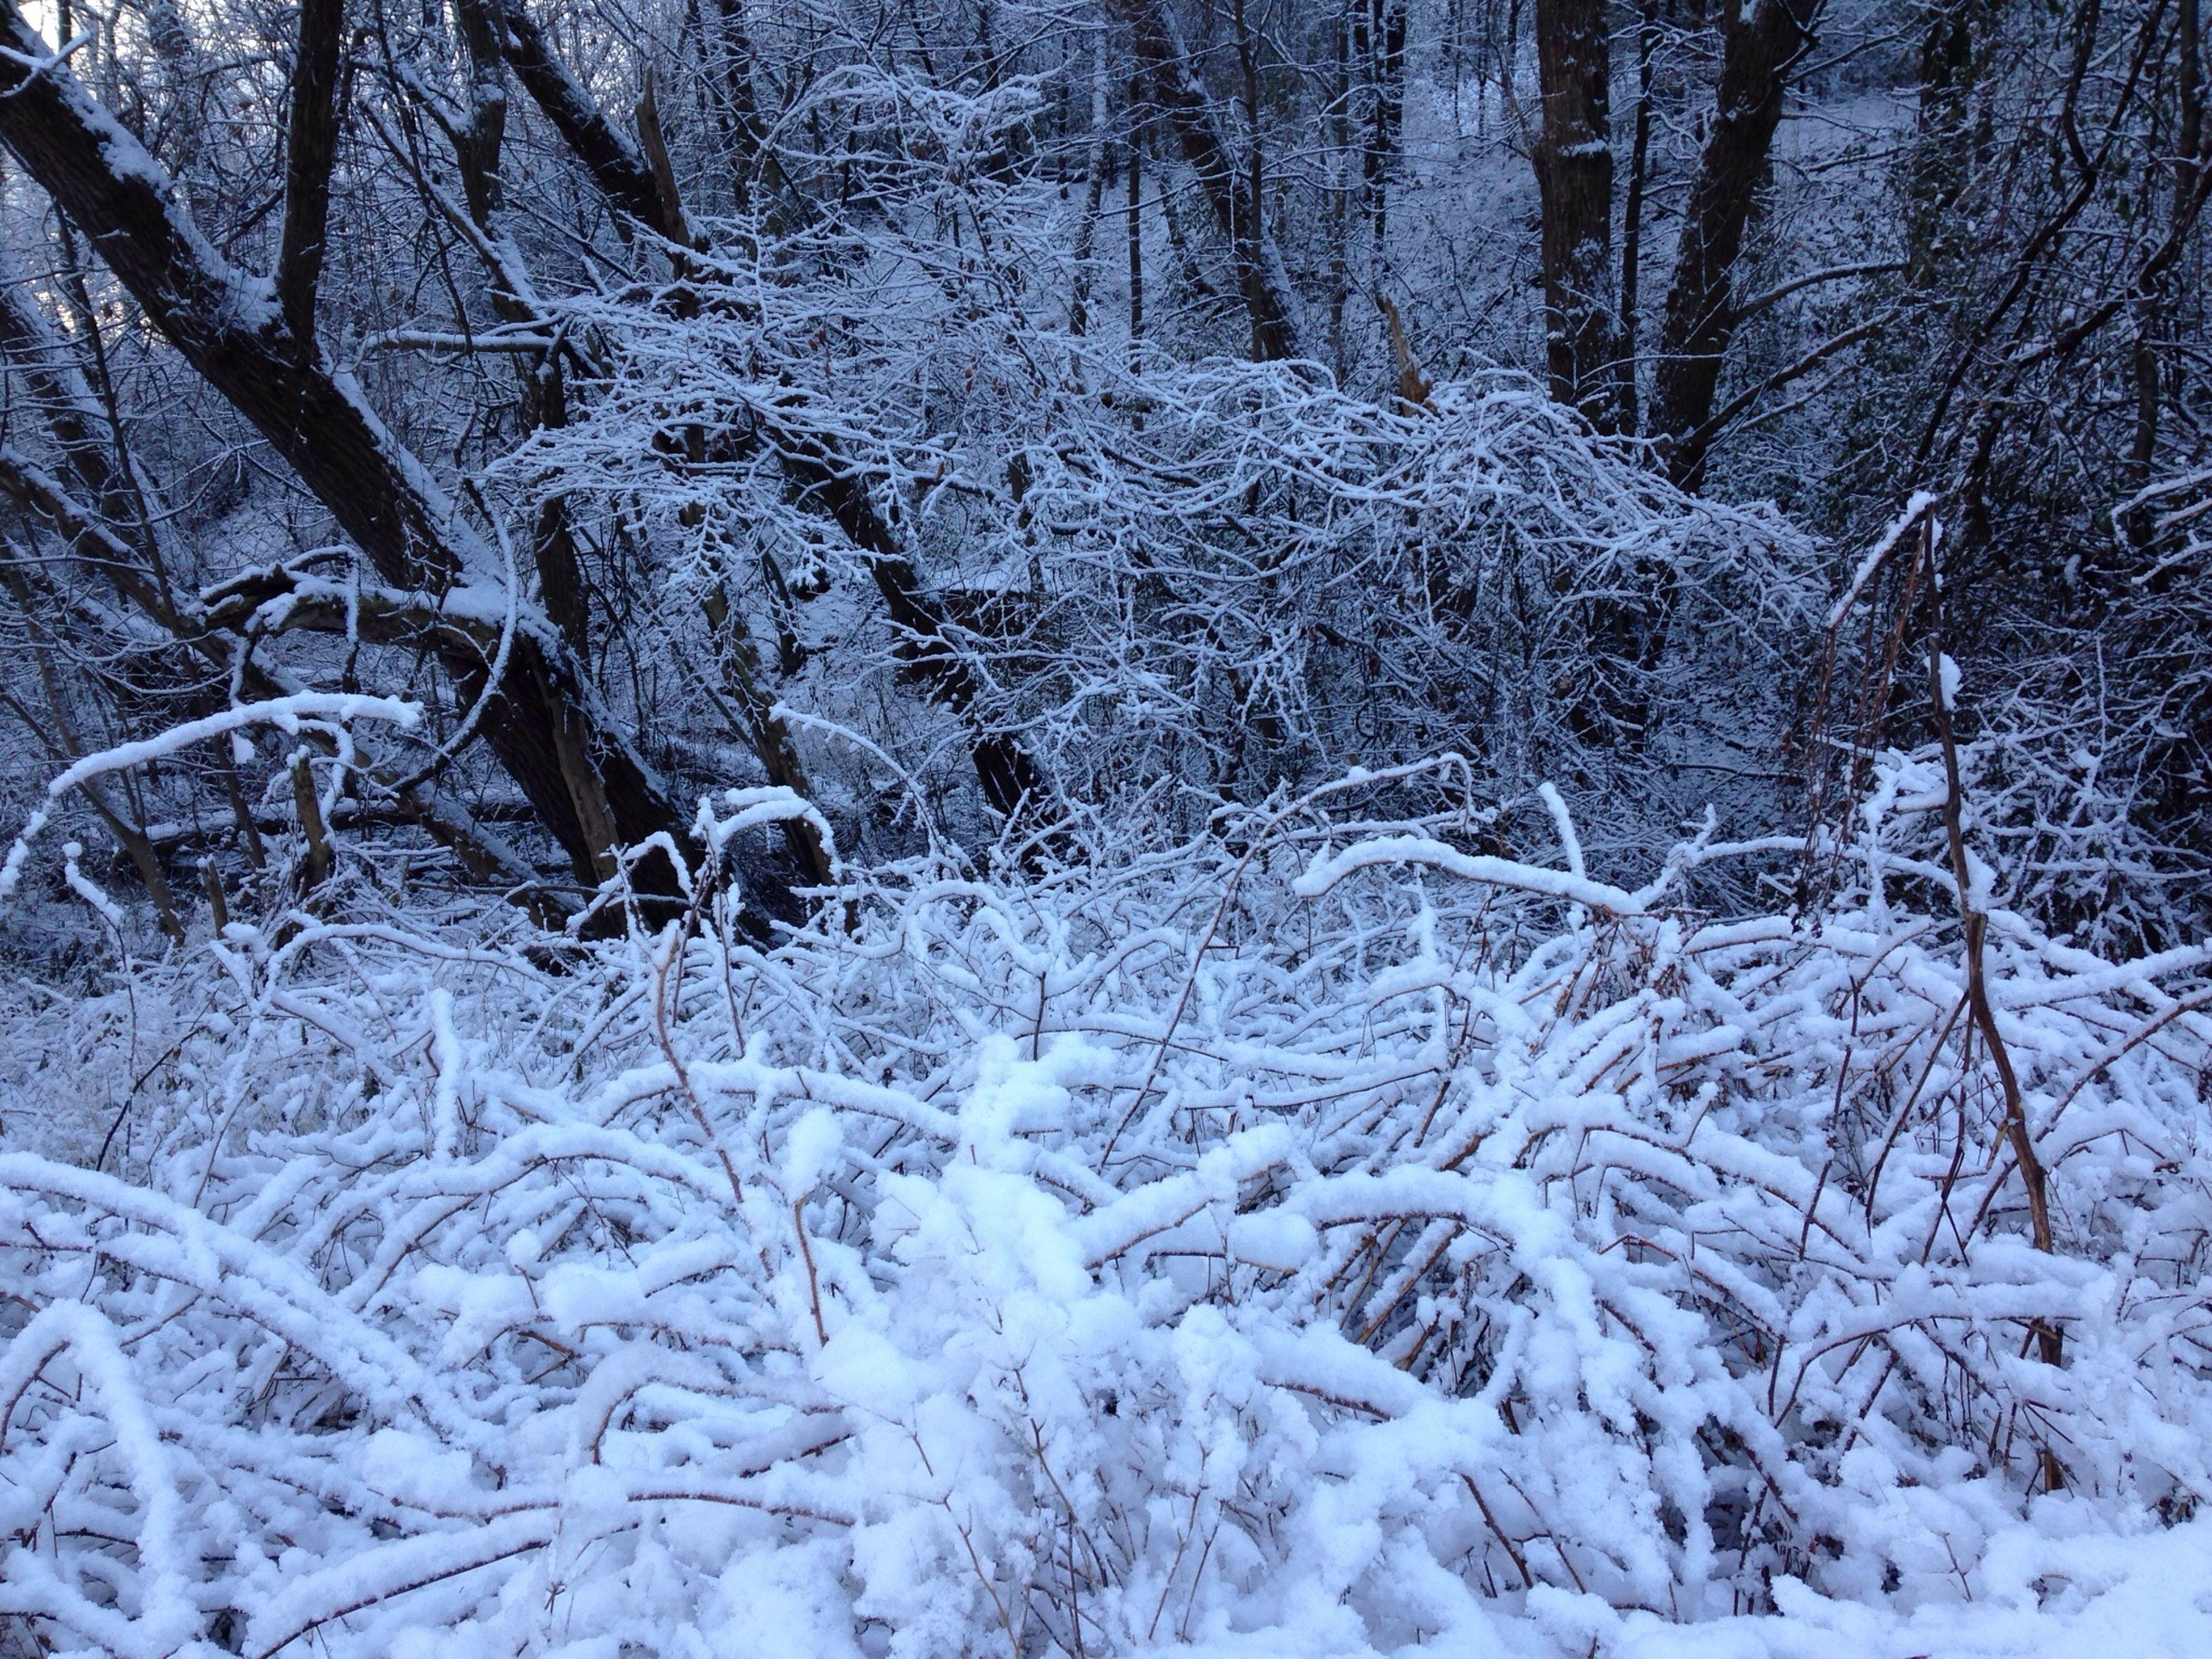 snow, winter, cold temperature, season, weather, bare tree, tree, tranquility, covering, tranquil scene, frozen, nature, beauty in nature, forest, scenics, branch, landscape, non-urban scene, covered, field